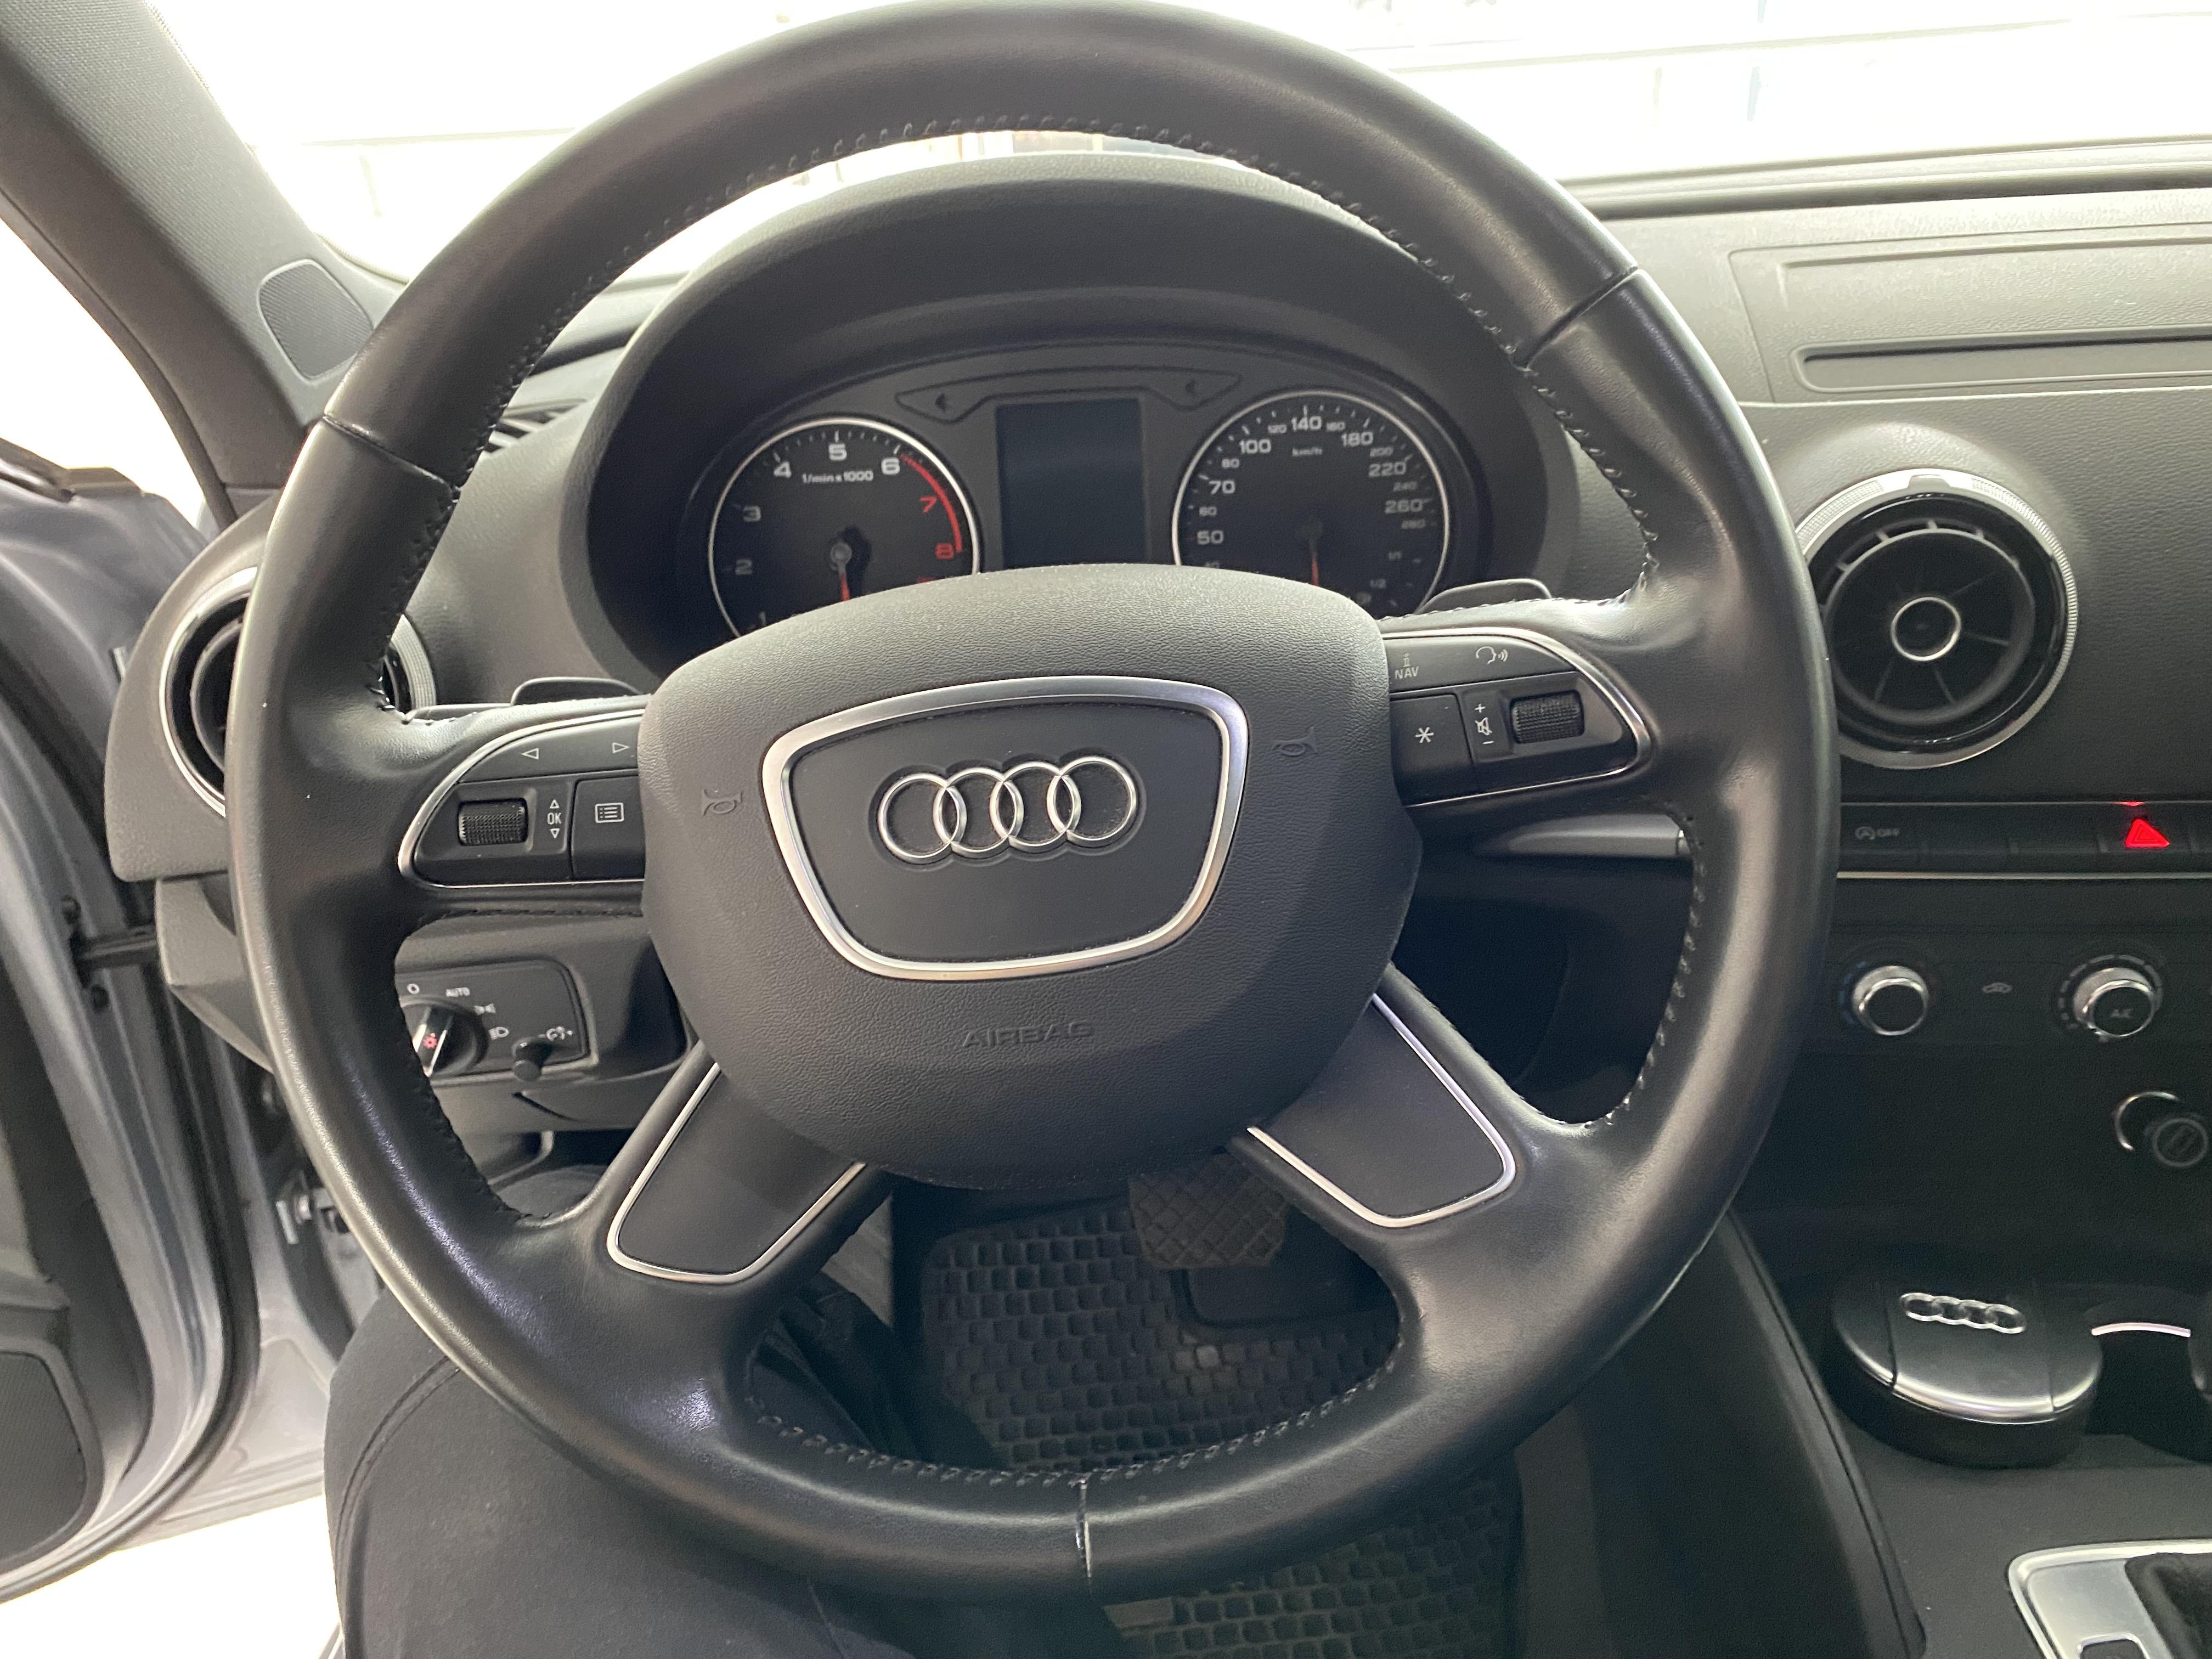 Audi A3 SB 1.4 TSFI AUT SLINE año 2016